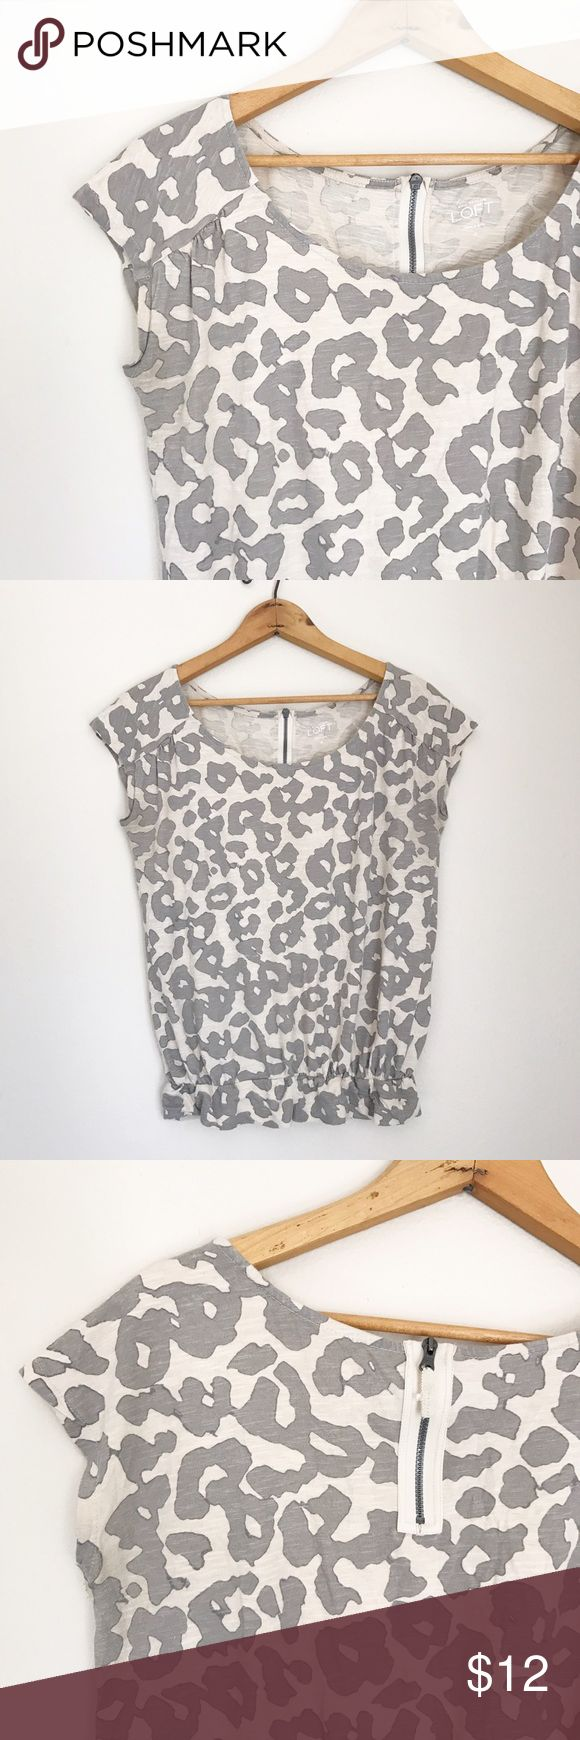 🚨FINAL 🚨 LOFT Cheetah print shirt Super comfy and very flattering! Gray and white cheetah print shirt with back zip! Size XS LOFT Tops Tees - Short Sleeve